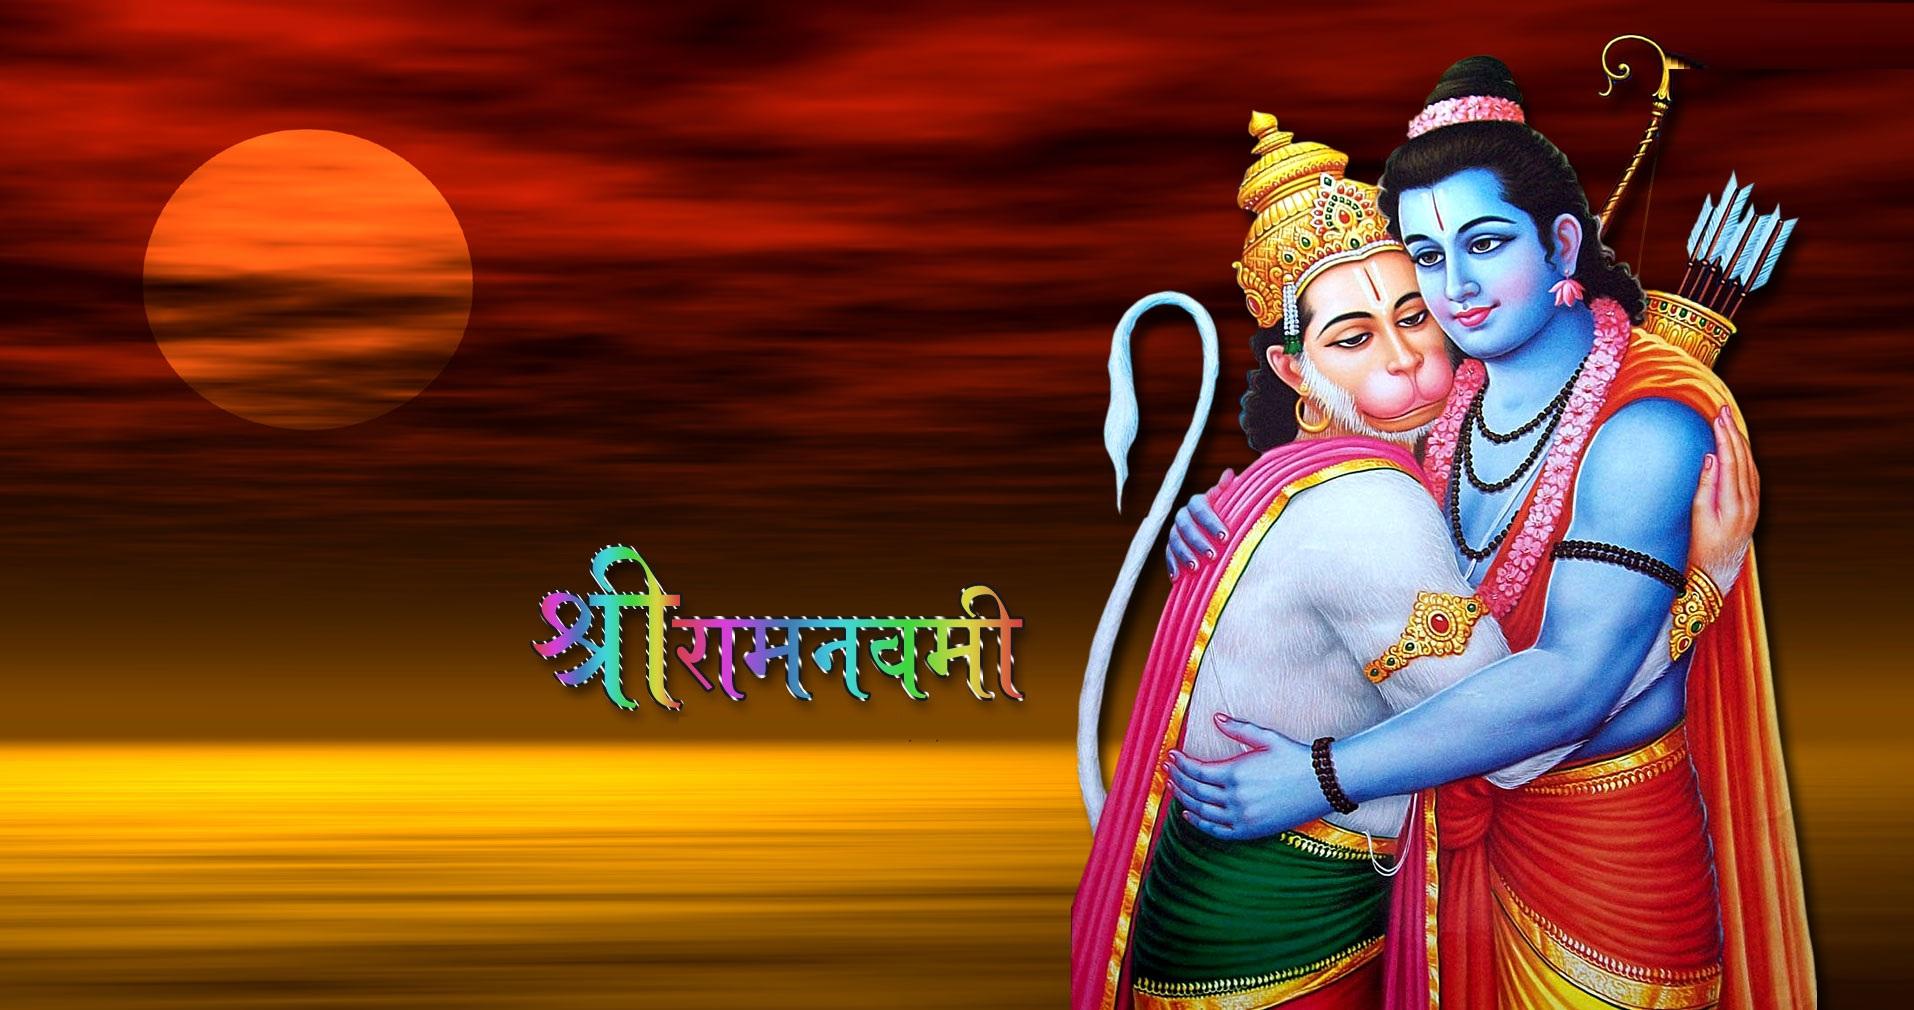 Ram Navami Images for Whatsapp DP, Profile Wallpapers – Free Download